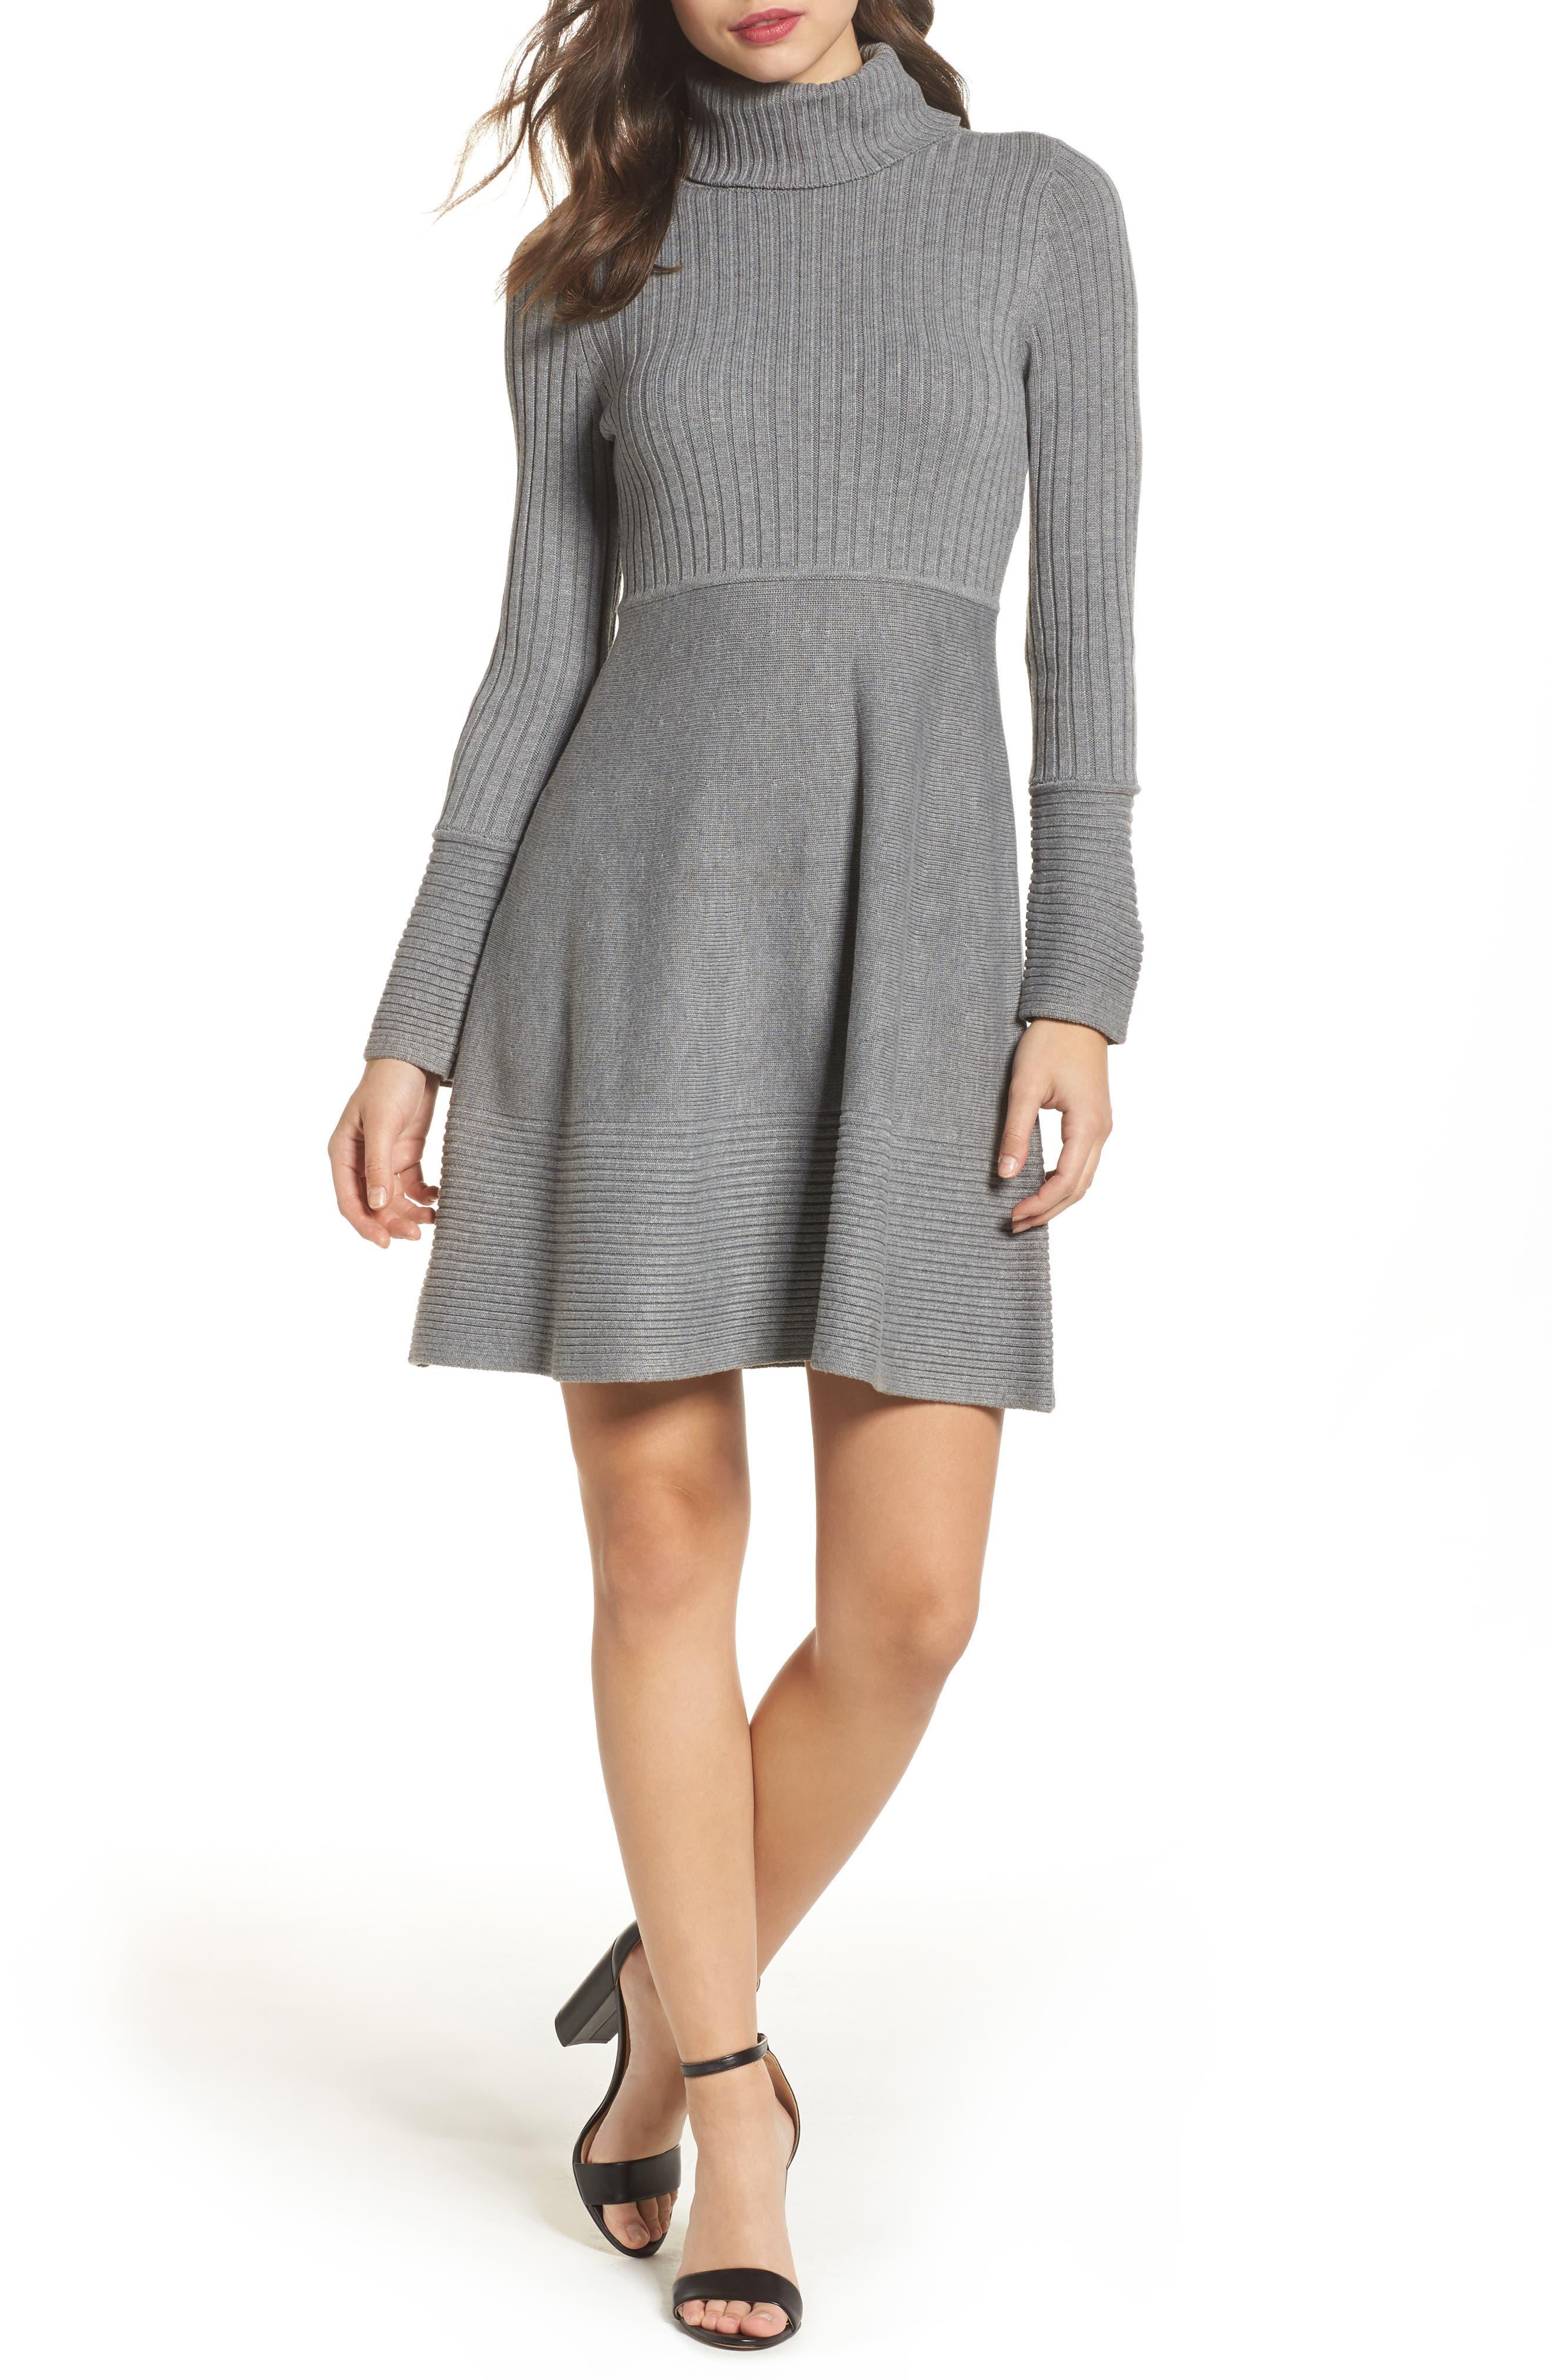 ELIZA J, Turtleneck Sweater Dress, Alternate thumbnail 6, color, GREY